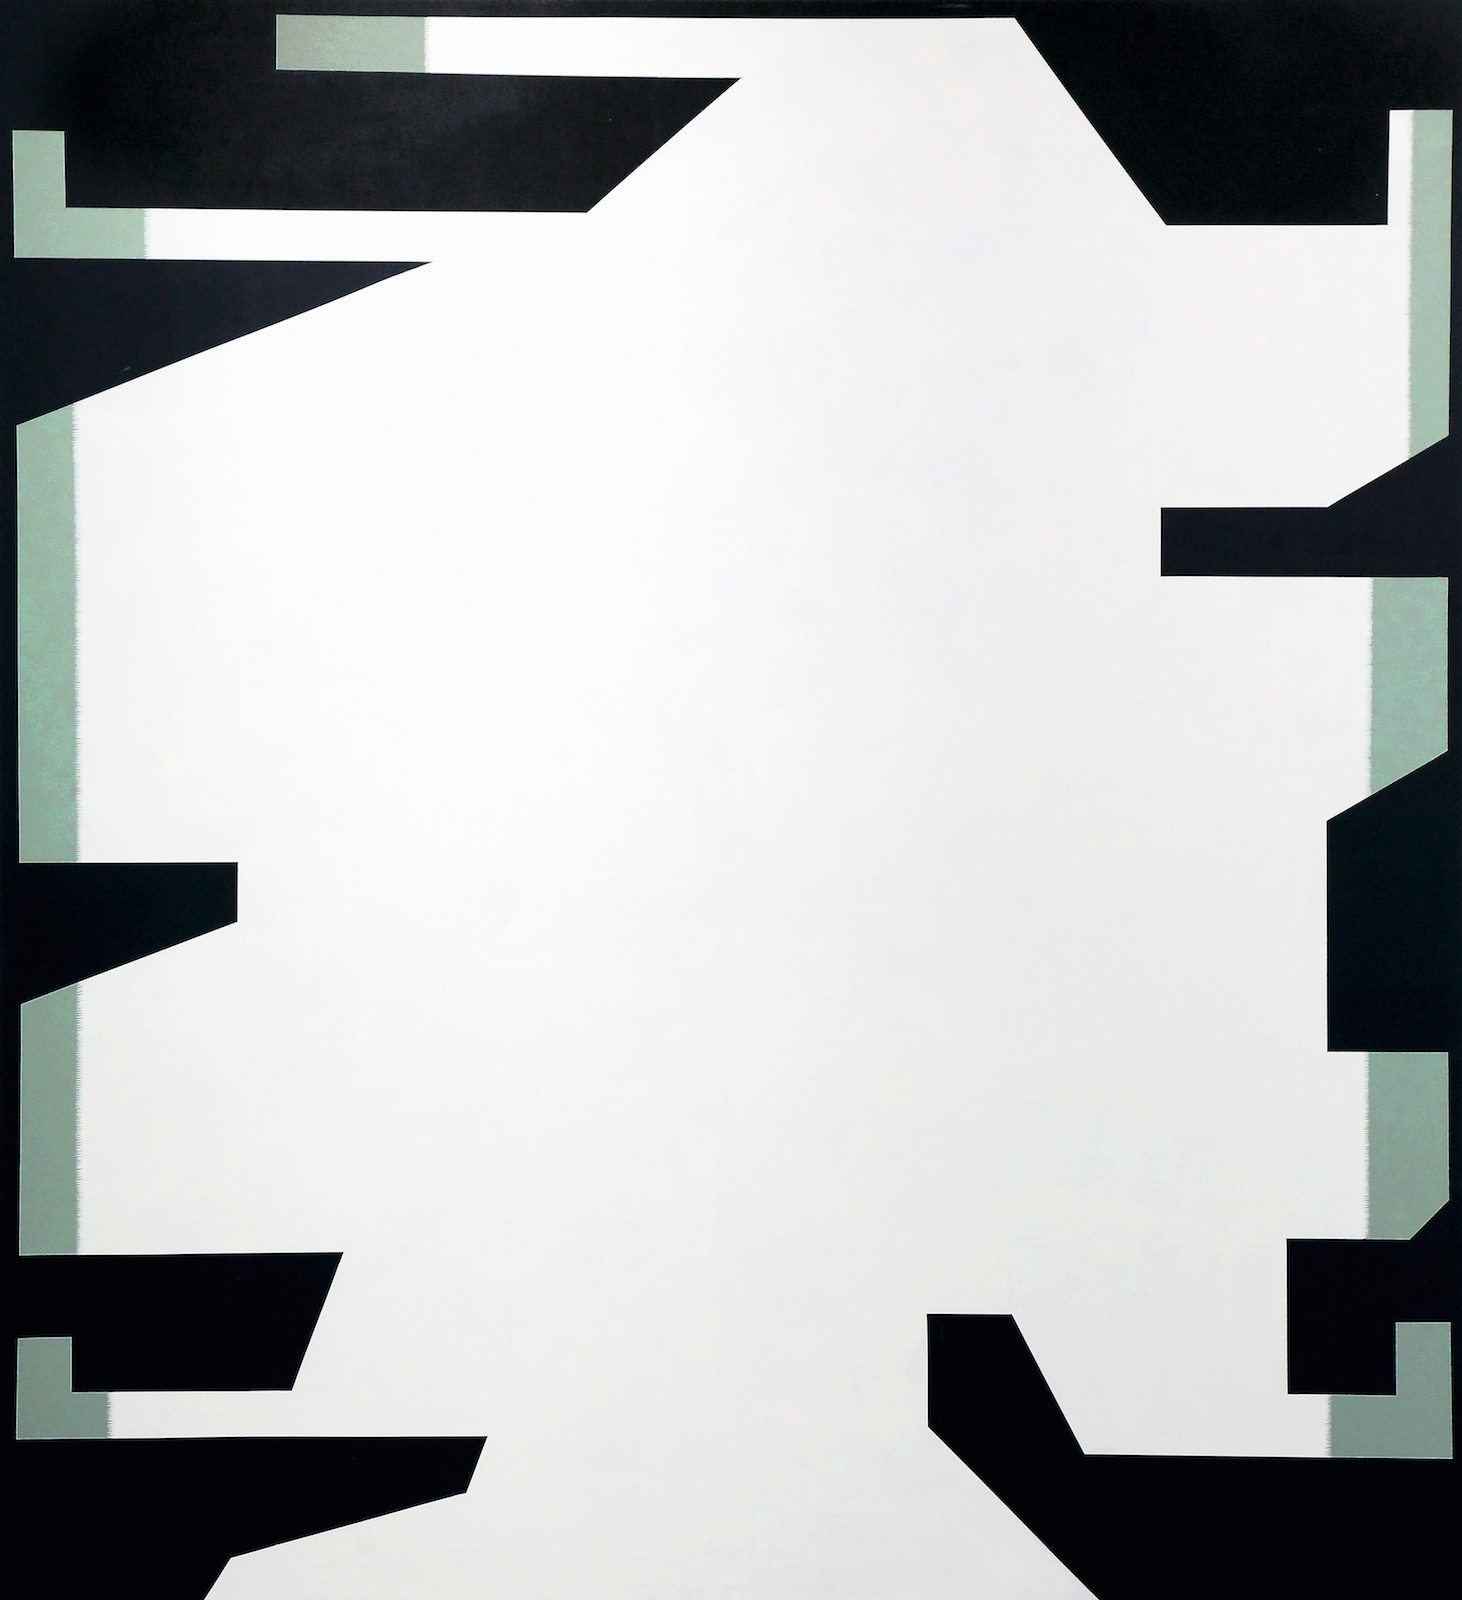 Bretagne No. 11, 2010, acrylic on canvas, 350 x 320 cm